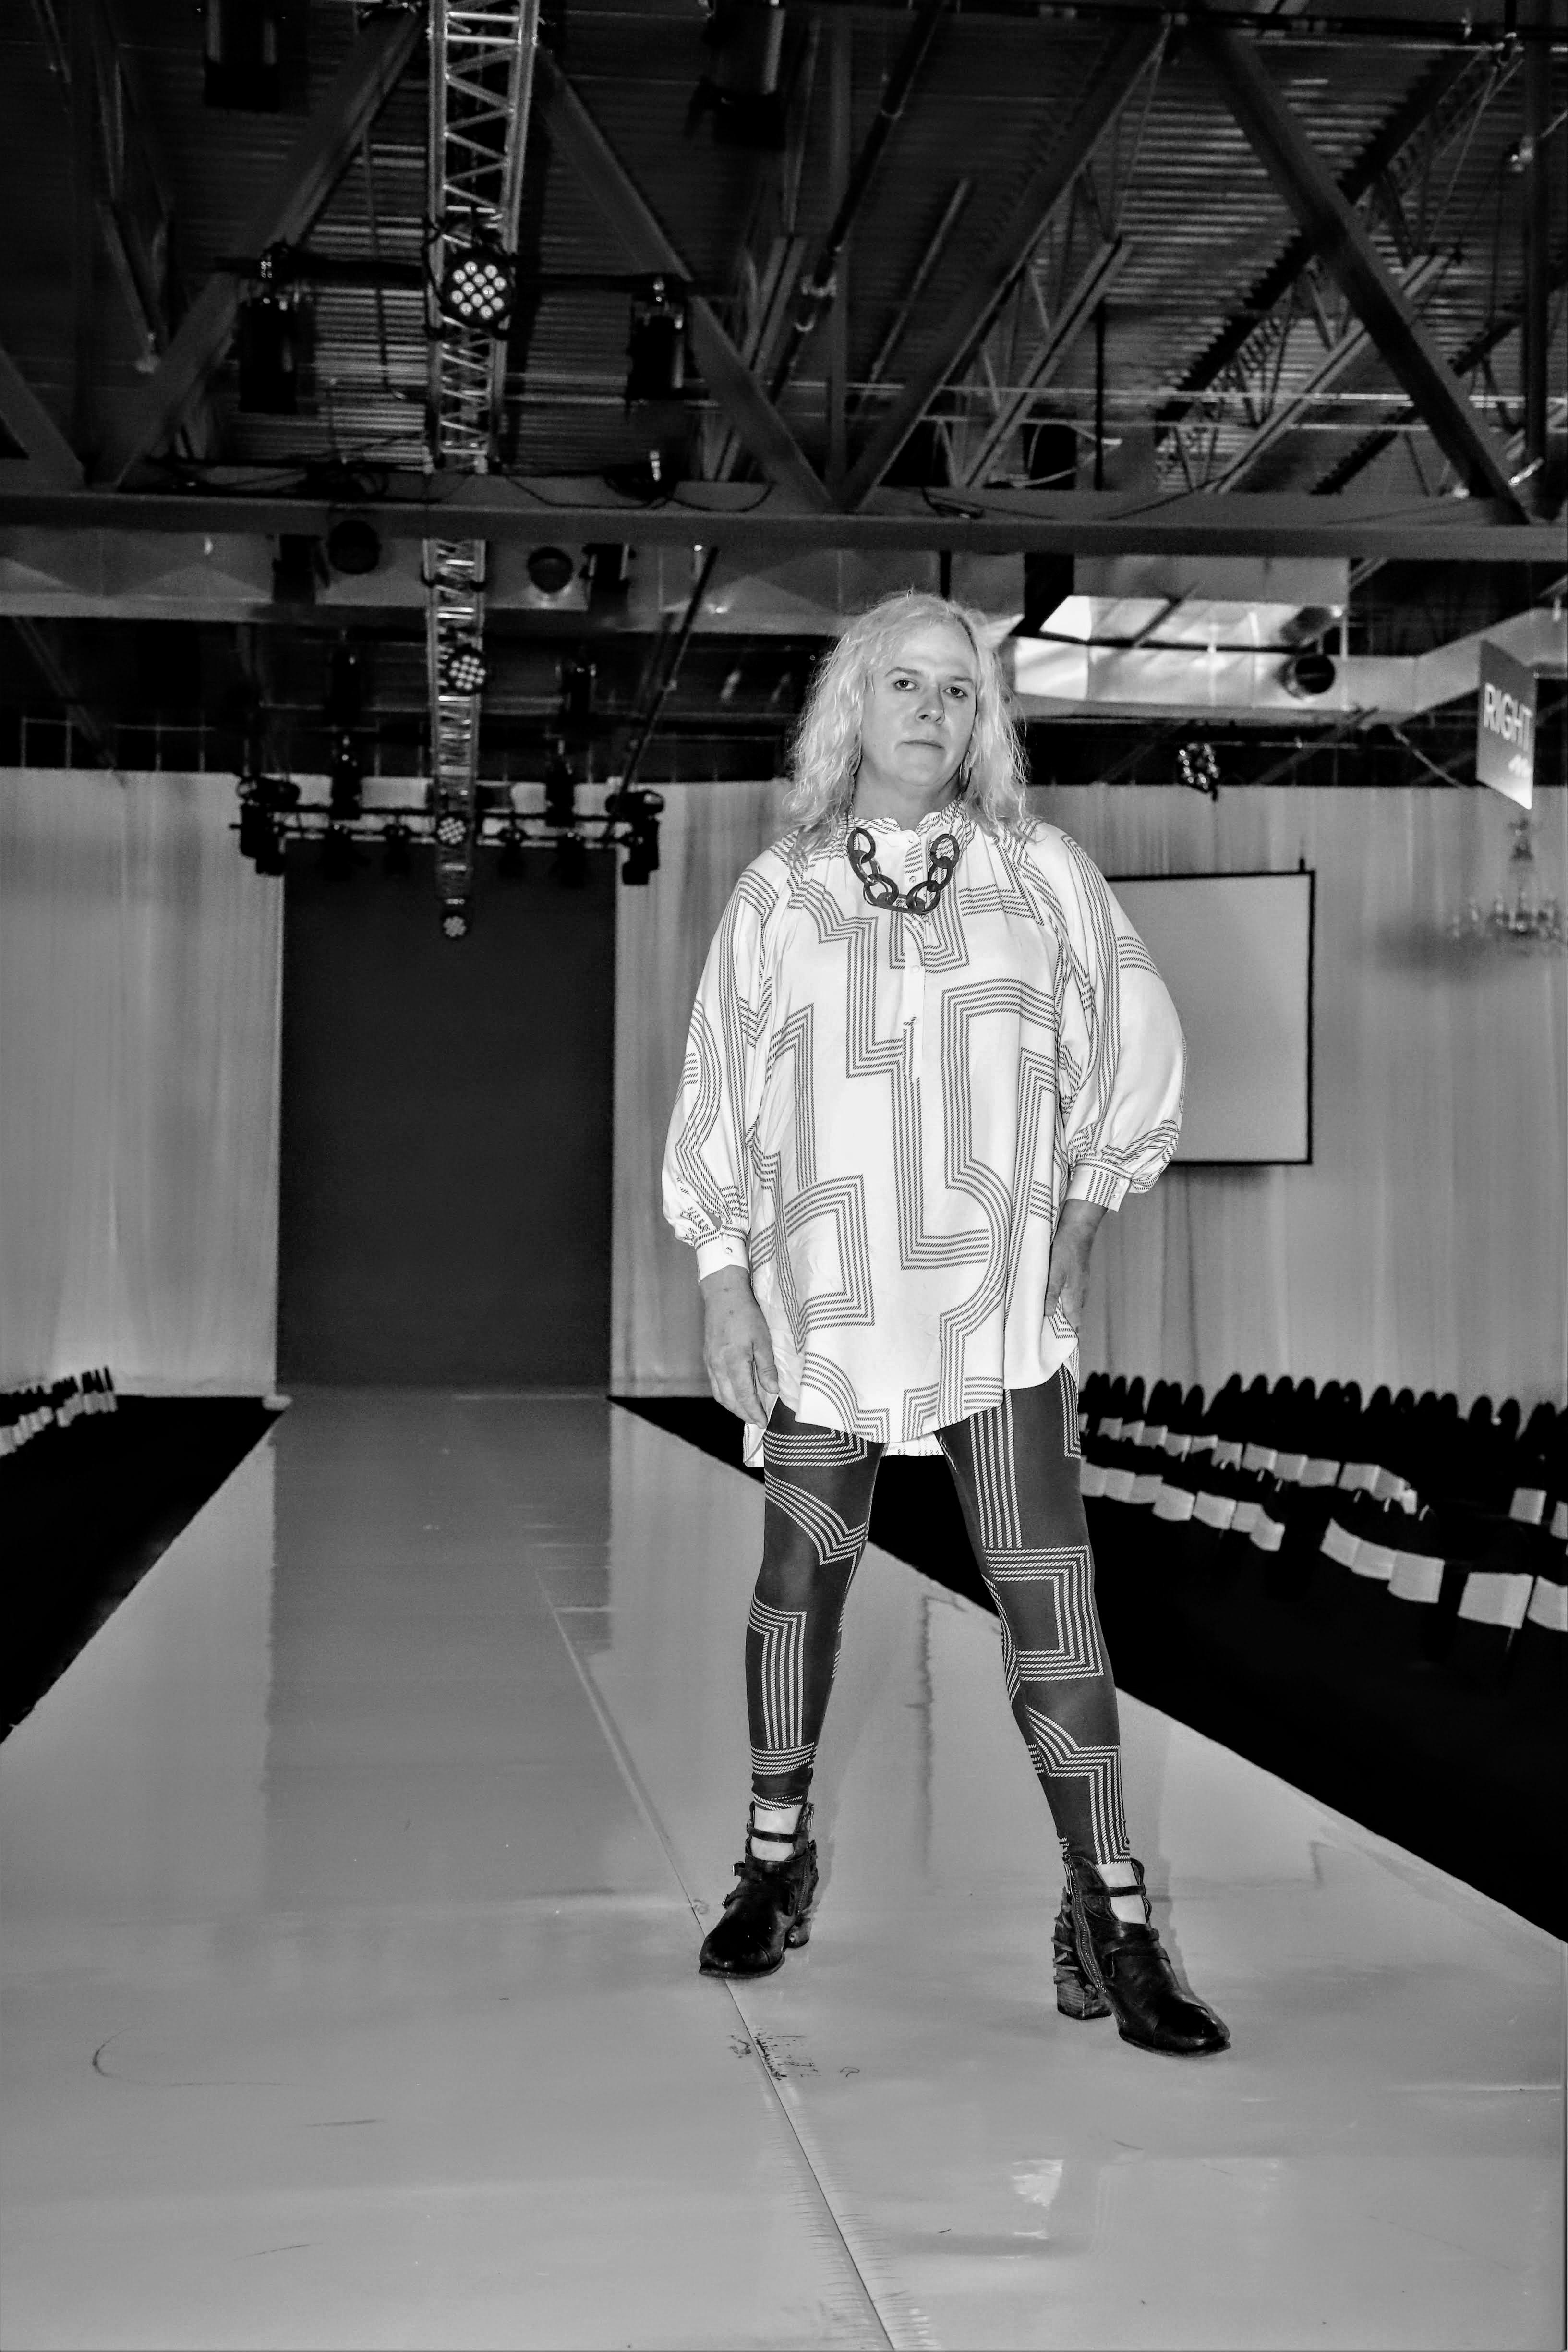 Jerra Kaitlynn Whittaker Prepares for New York Fashion Week Comeback, Embraces Acceptance to Global Female Community